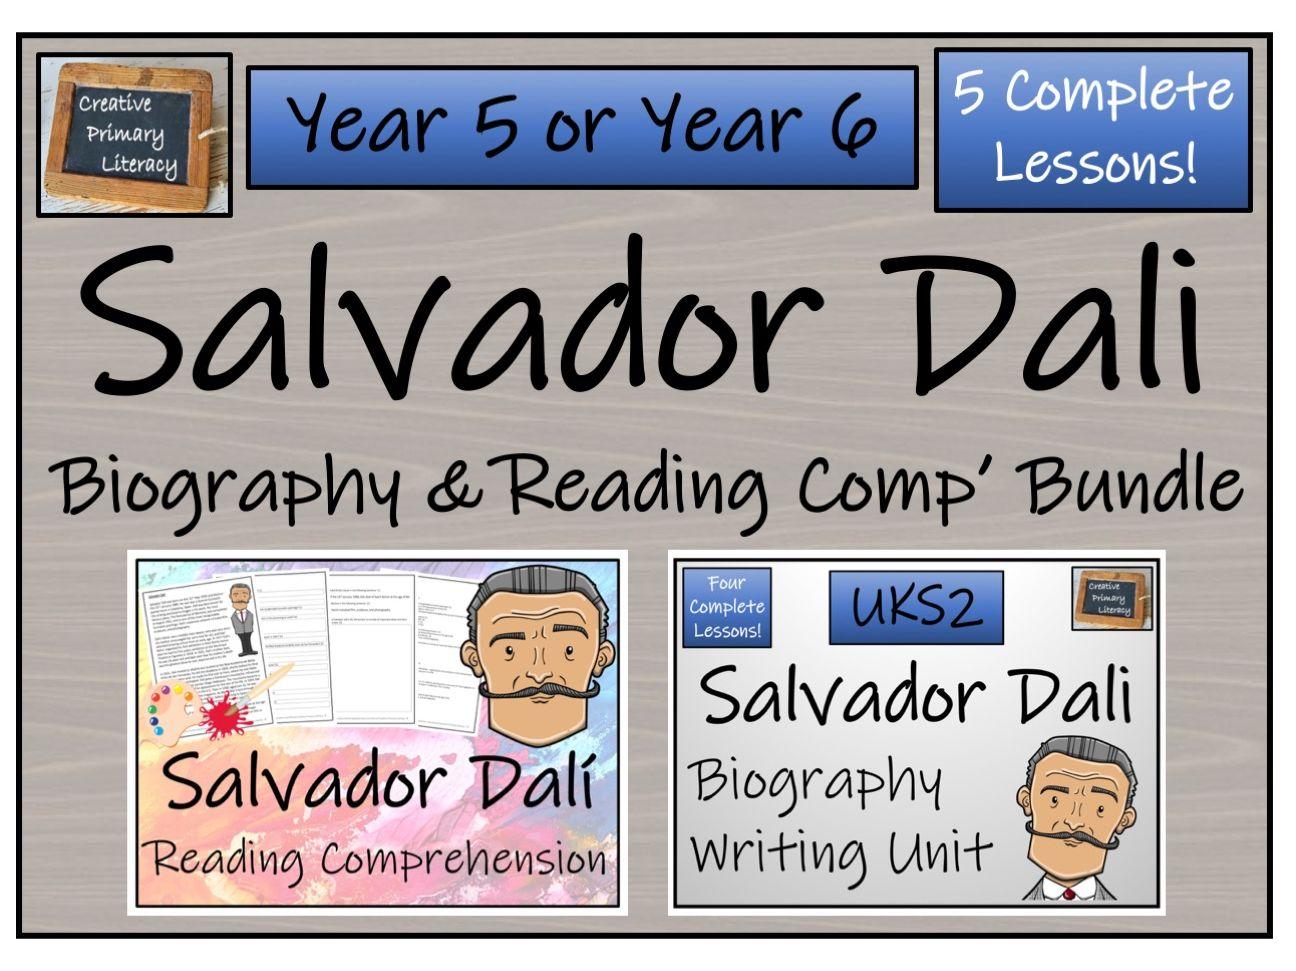 UKS2 Literacy - Salvador Dali Reading Comprehension & Biography Bundle